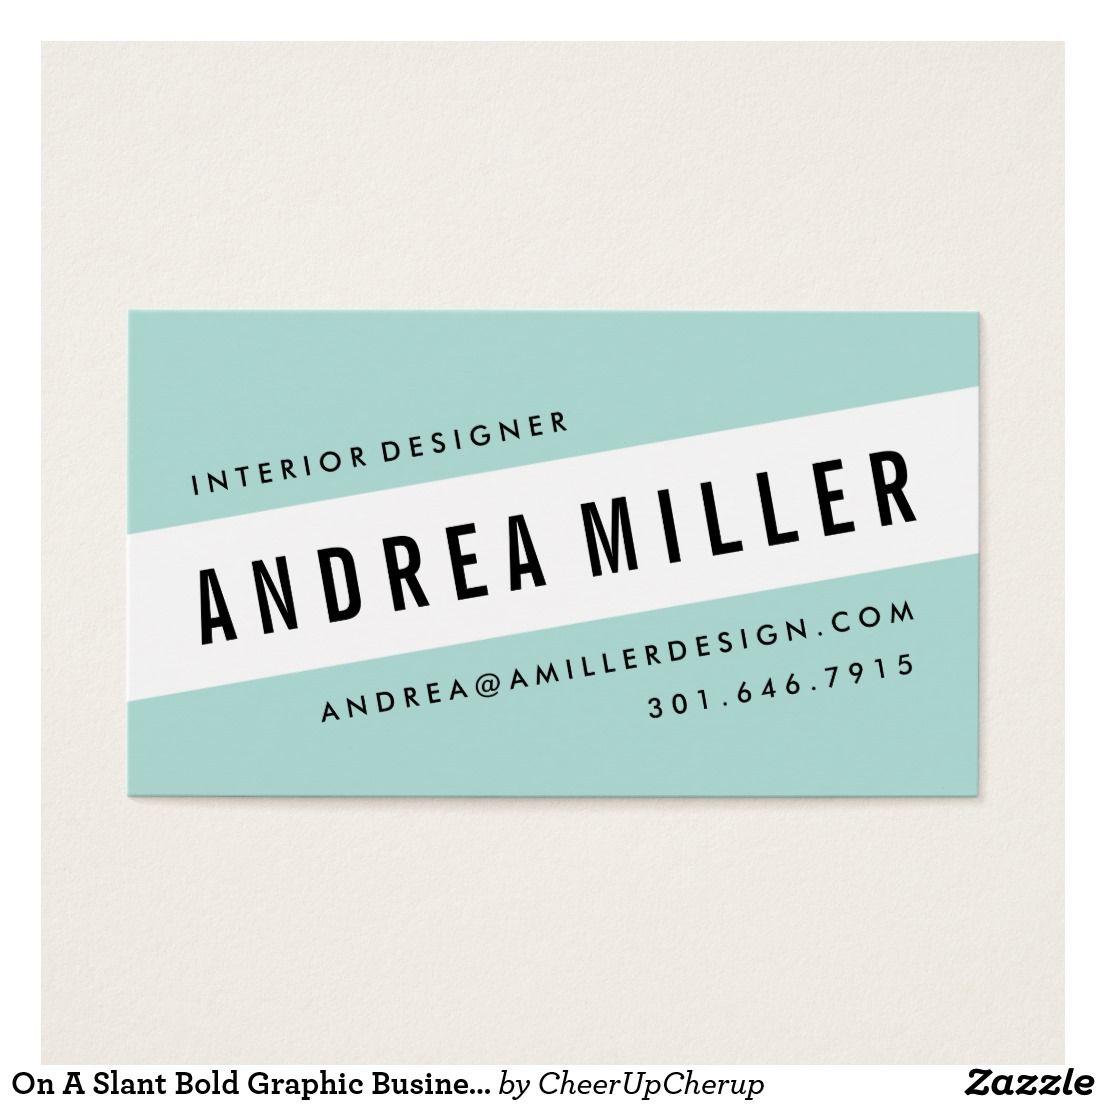 On A Slant Bold Graphic Business Card @zazzle #zazzle #businesscard ...